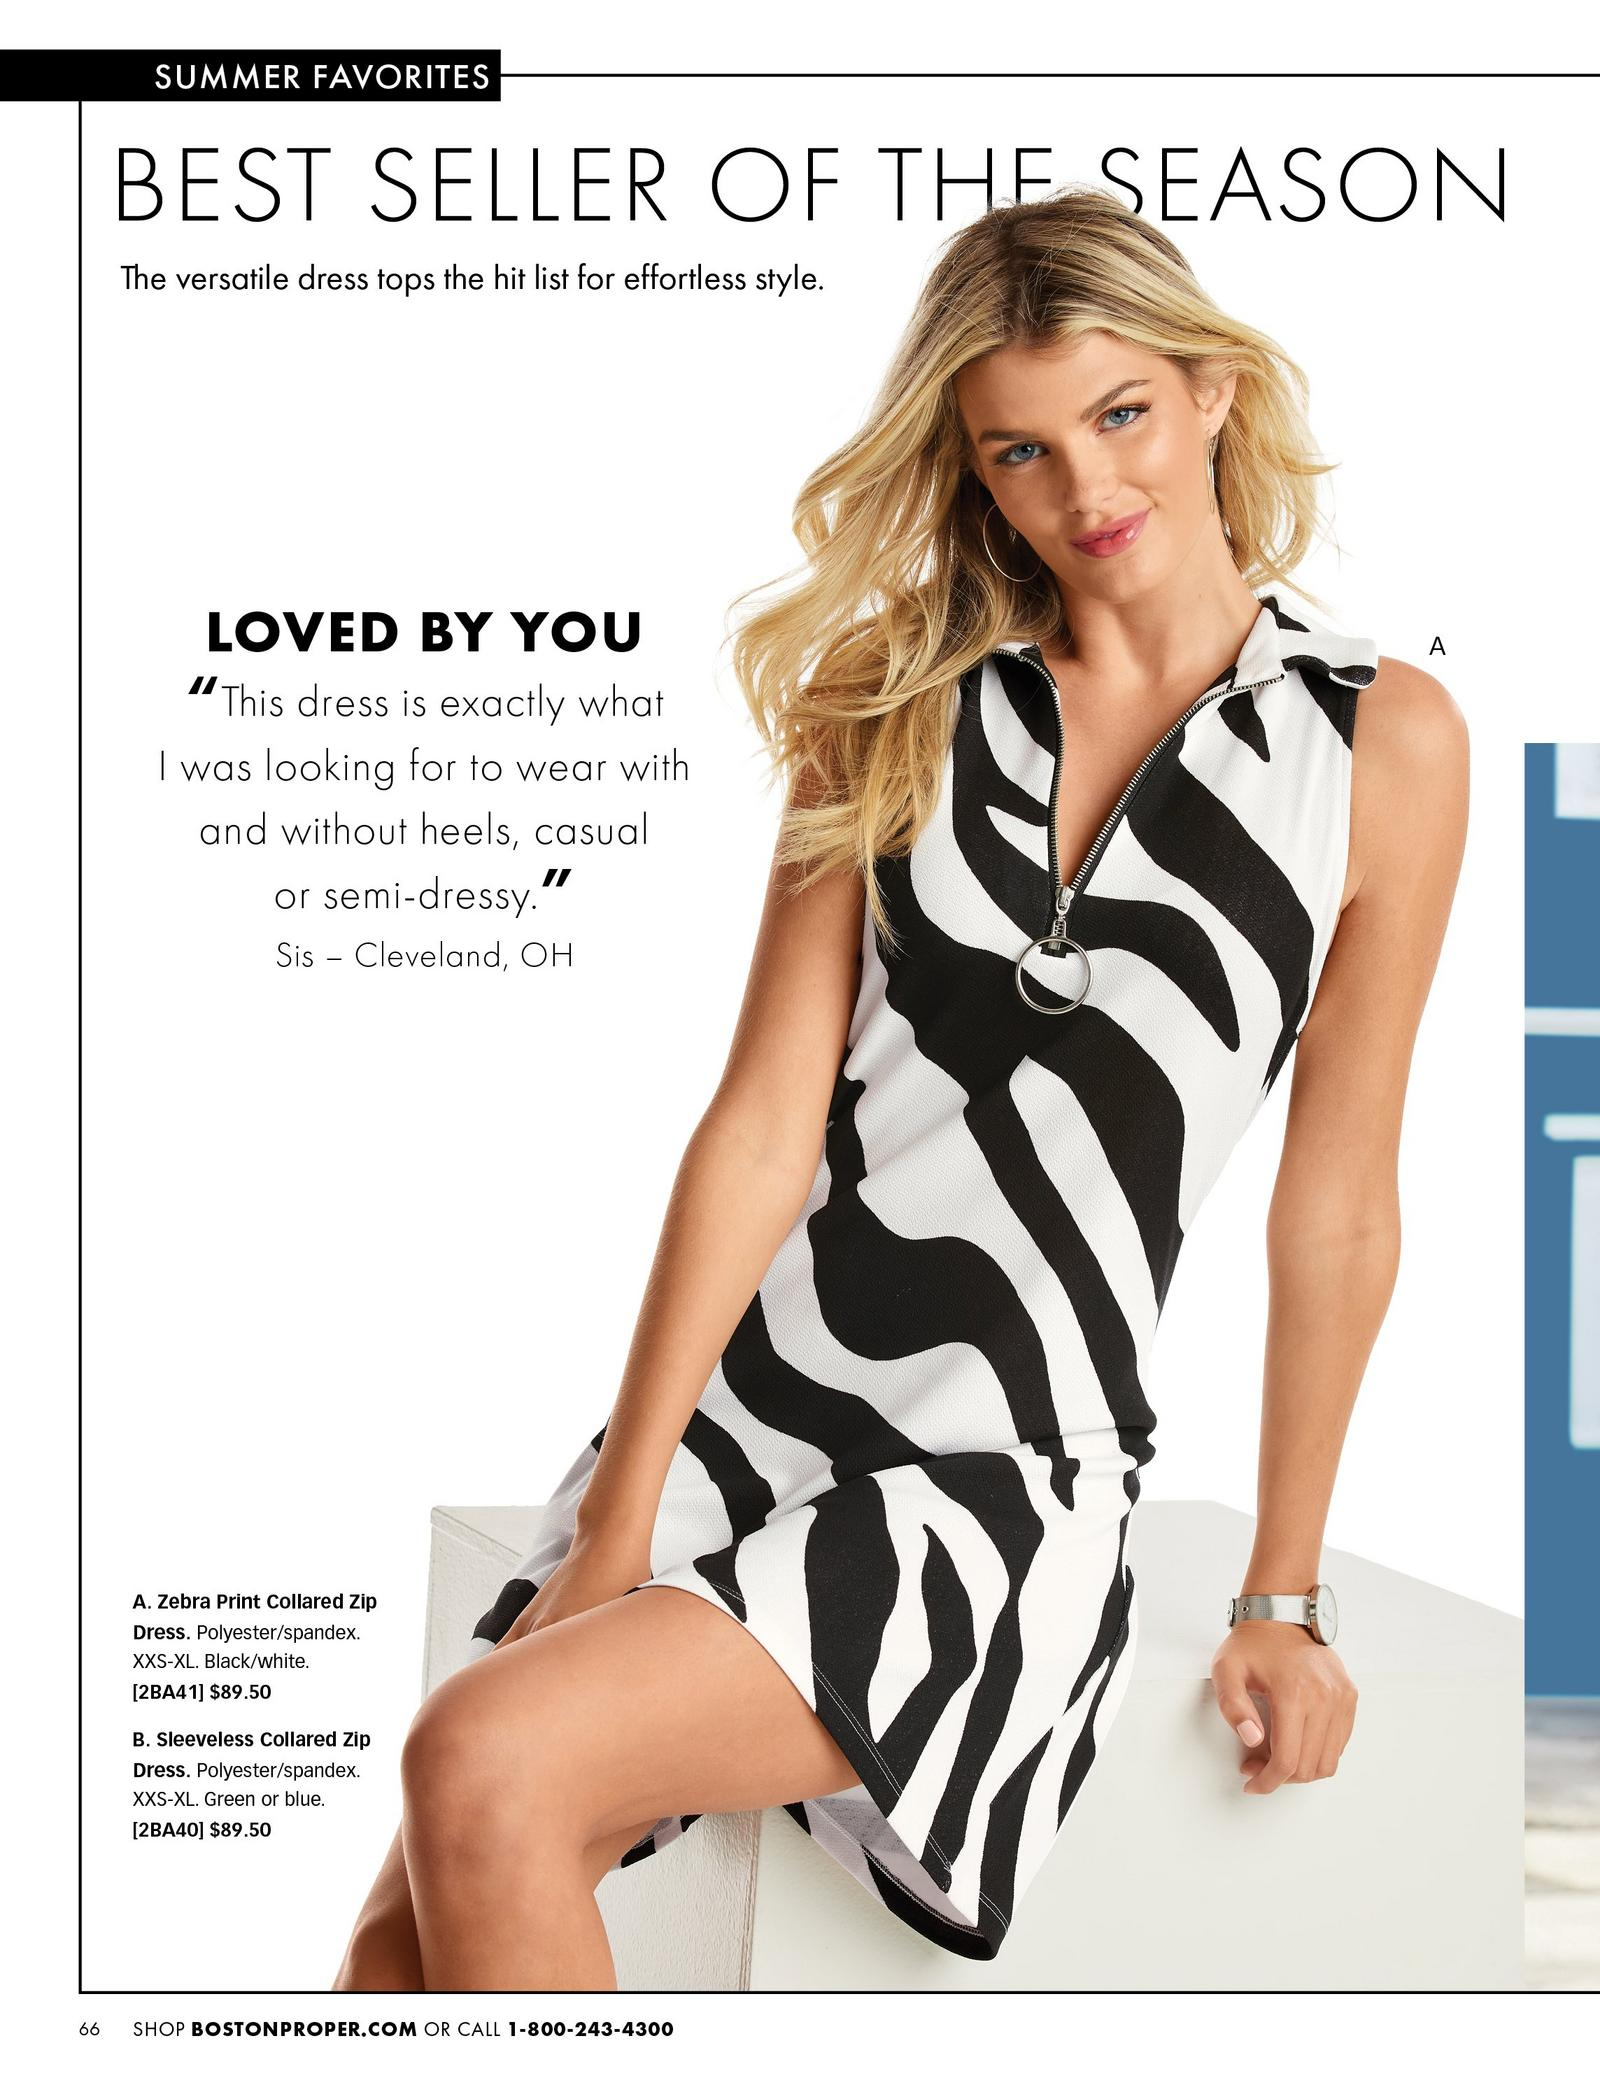 model wearing a black and white zebra striped sleeveless collared dress.